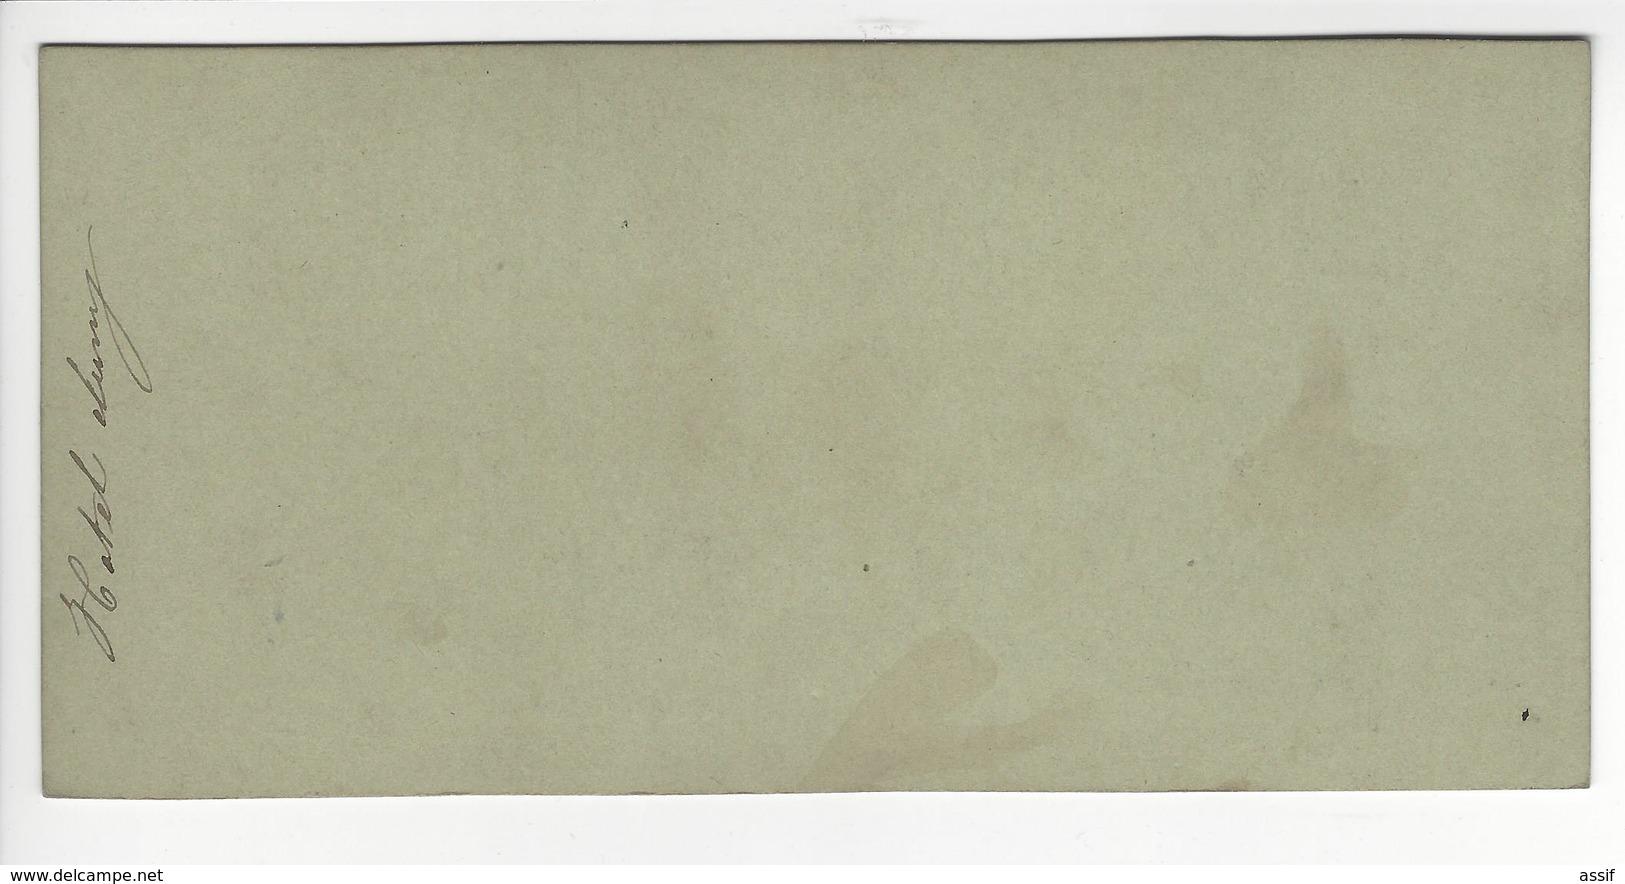 PHOTO STEREO Circa 1850 1860 PARIS /FREE SHIPPING REGISTERED - Photos Stéréoscopiques